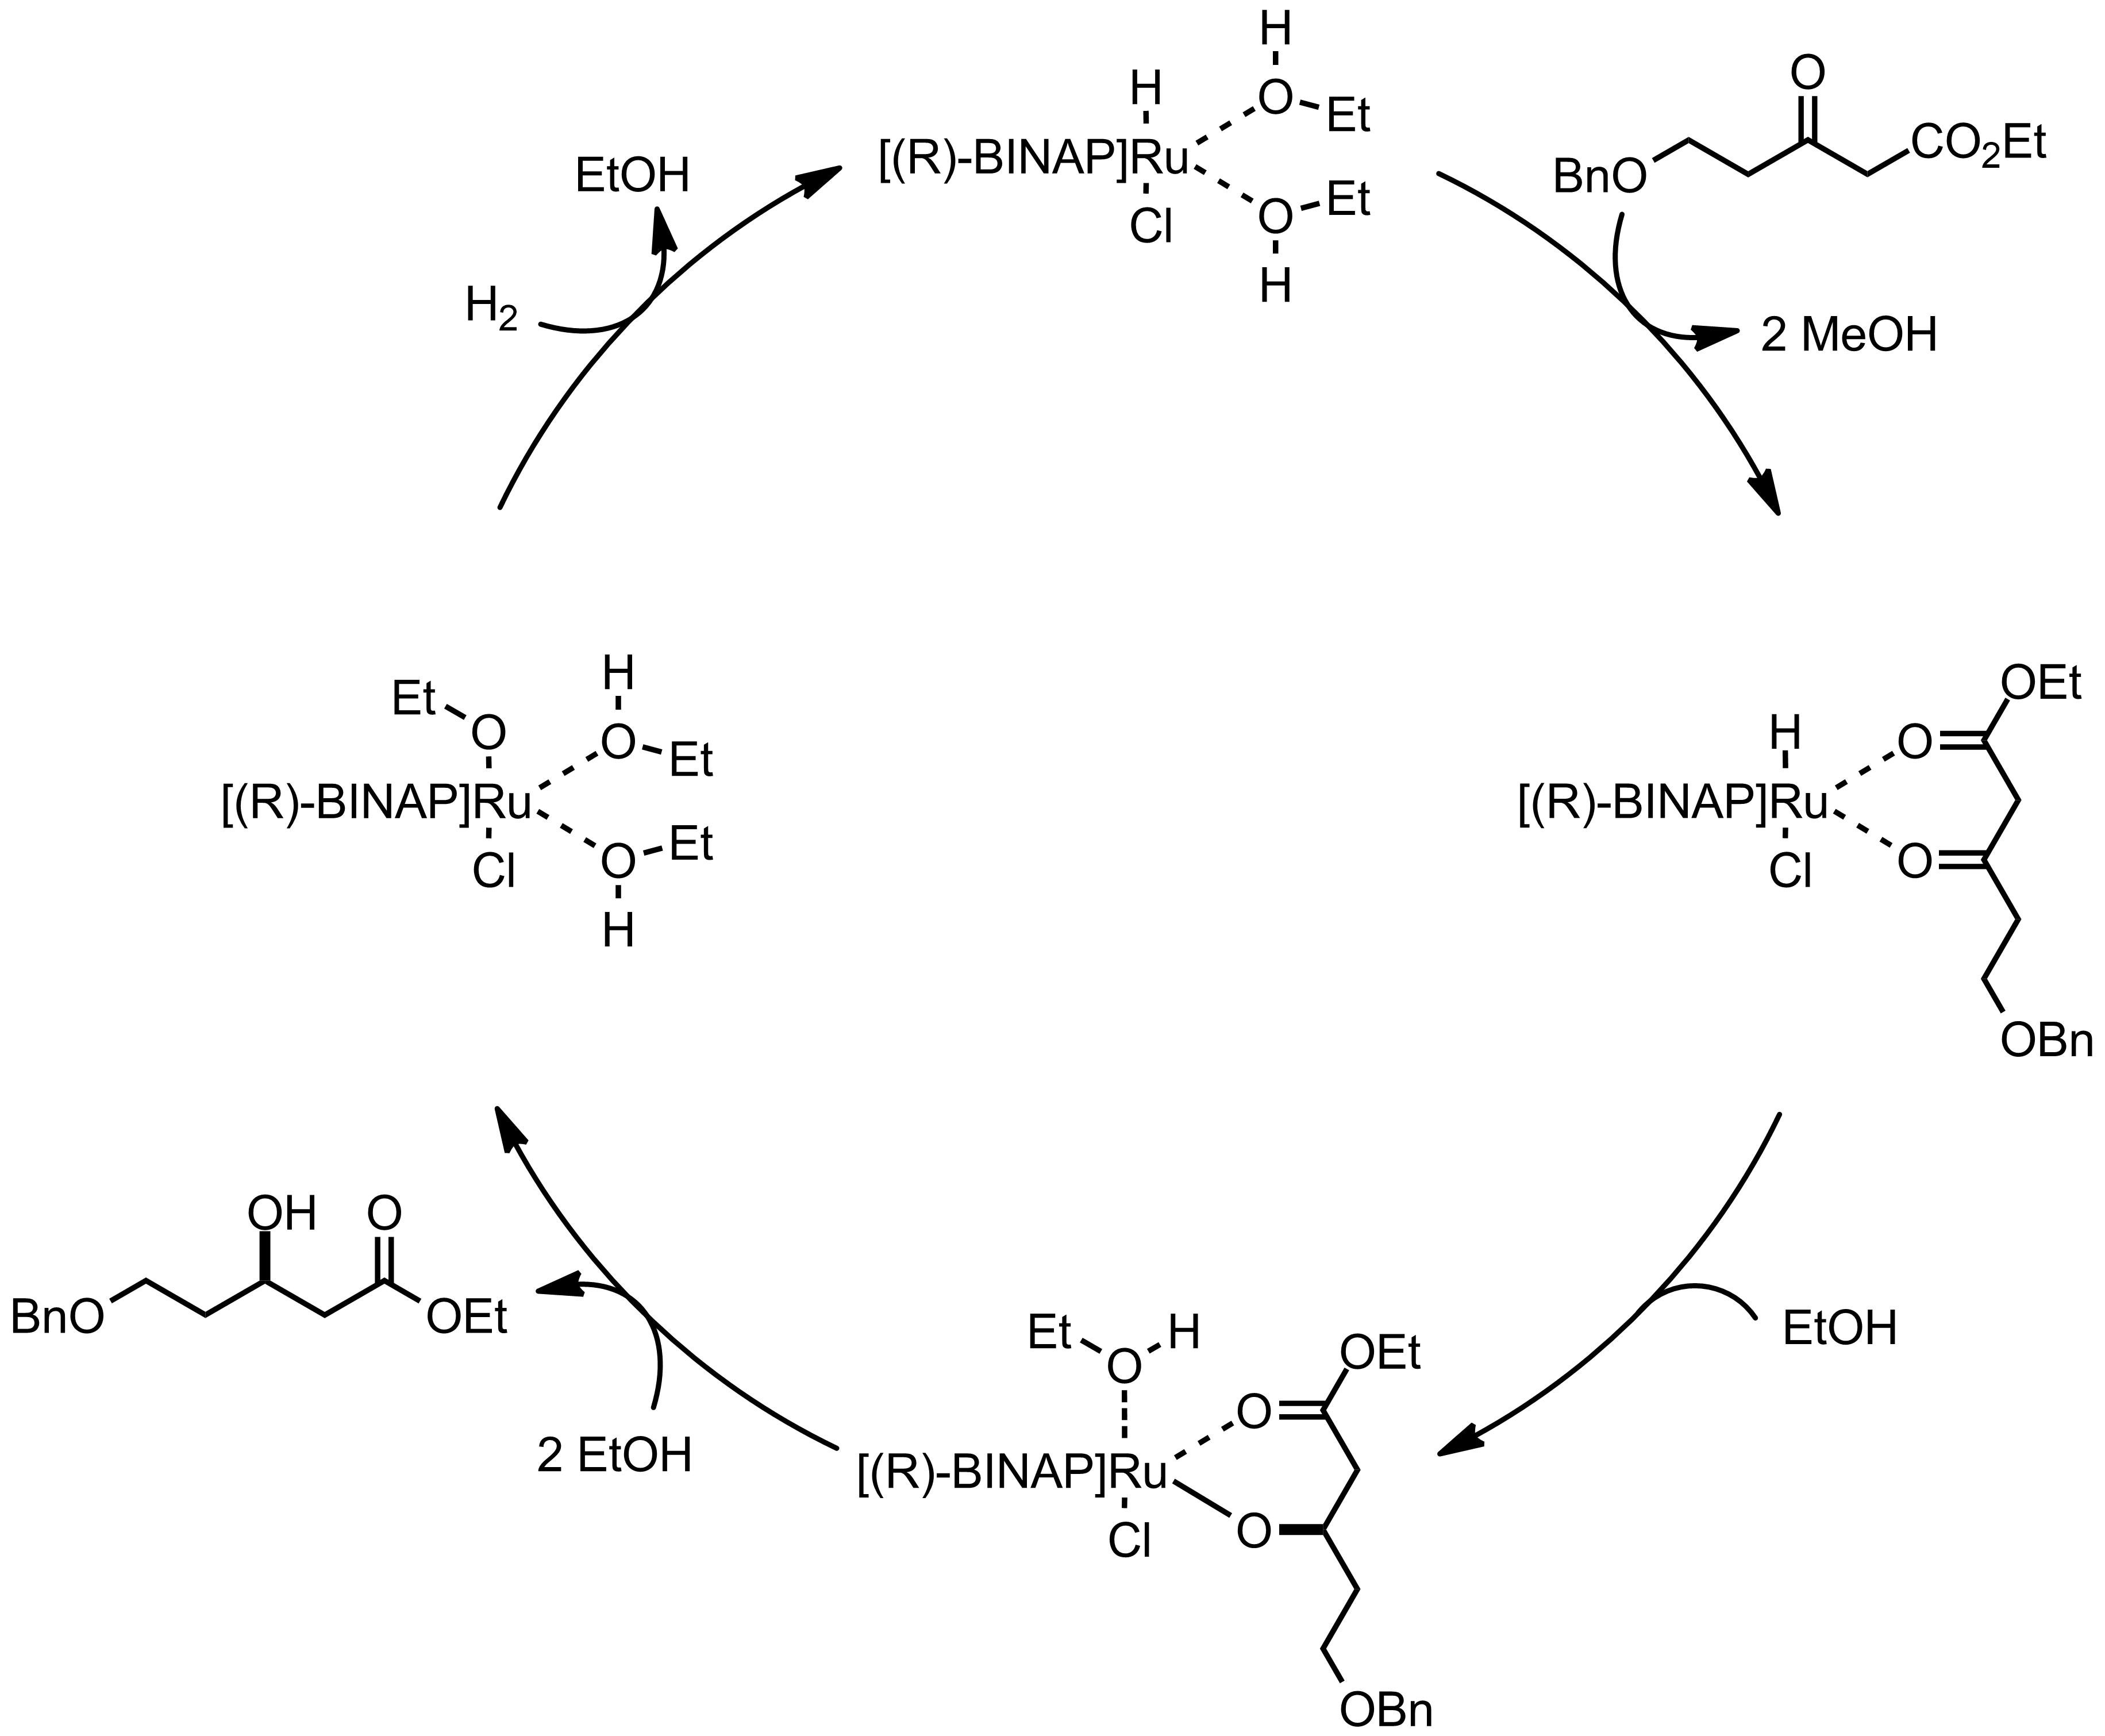 Mechanism of the Noyori Asymmetric Hydrogenation